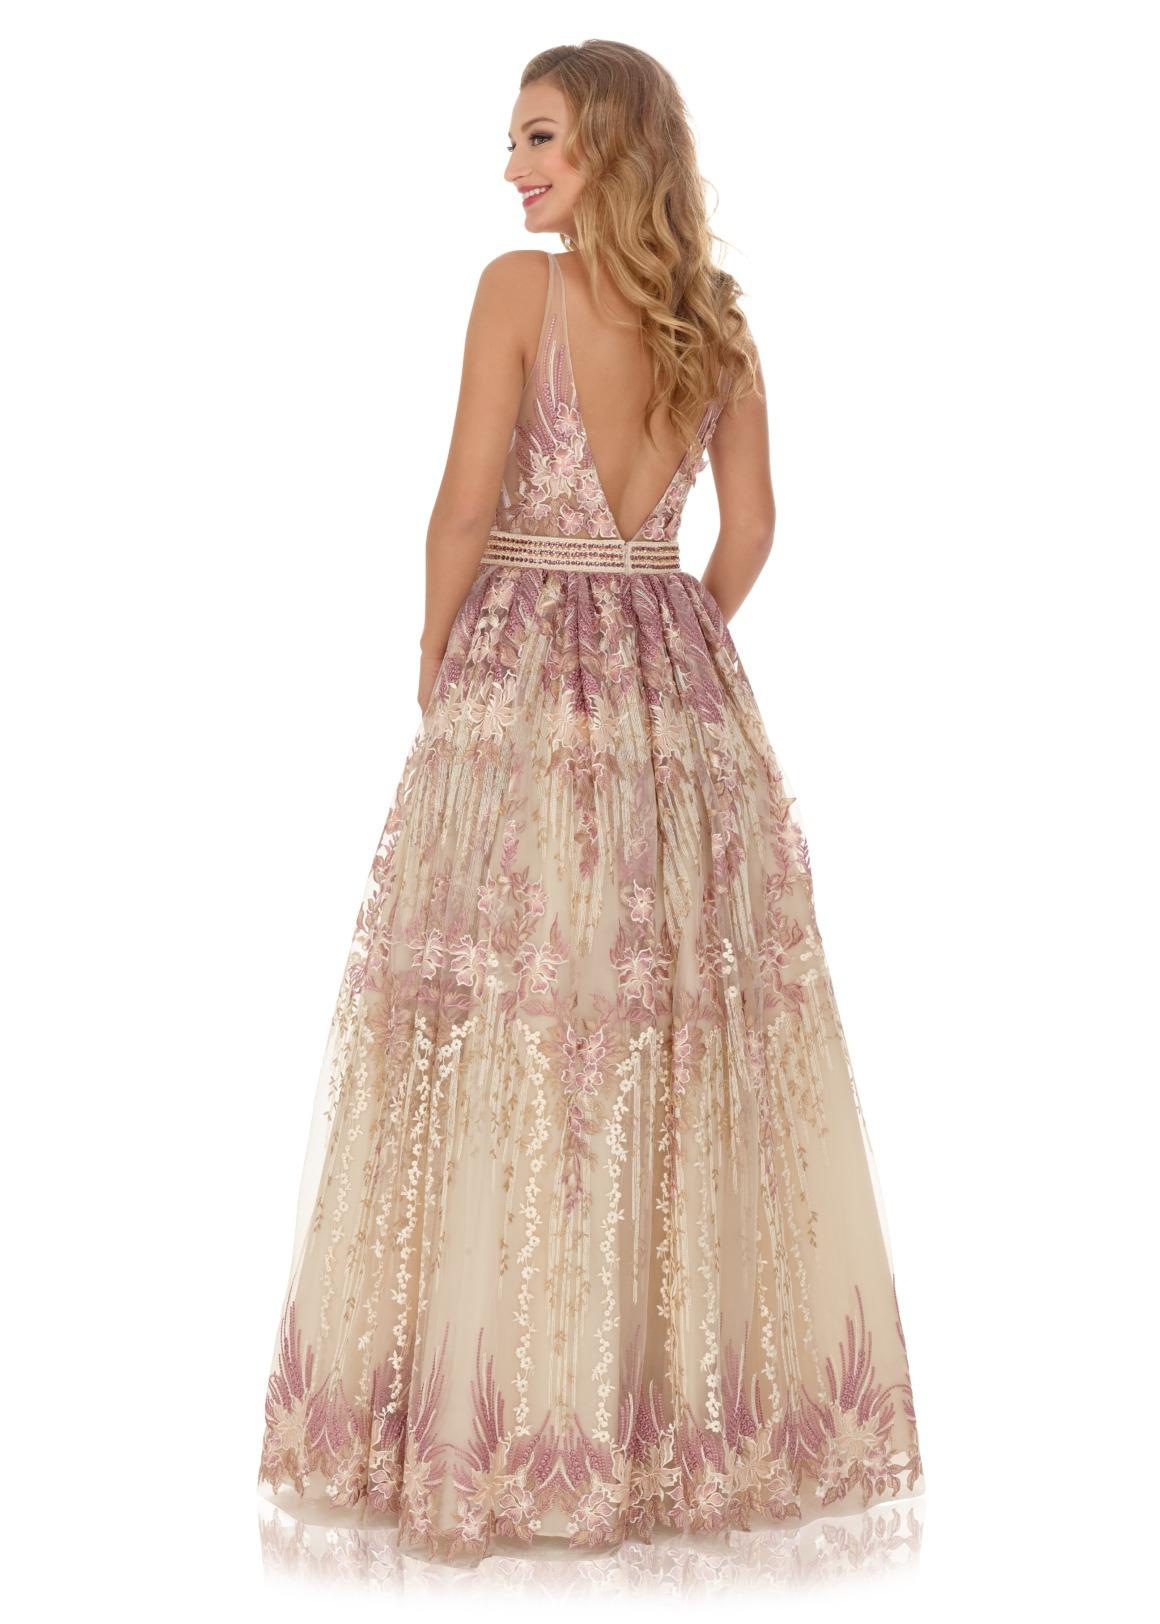 Schützenfest Königinnenkleid Hofdamen Hofstaat Kleid V-Ausschnitt Rücken rose blumen